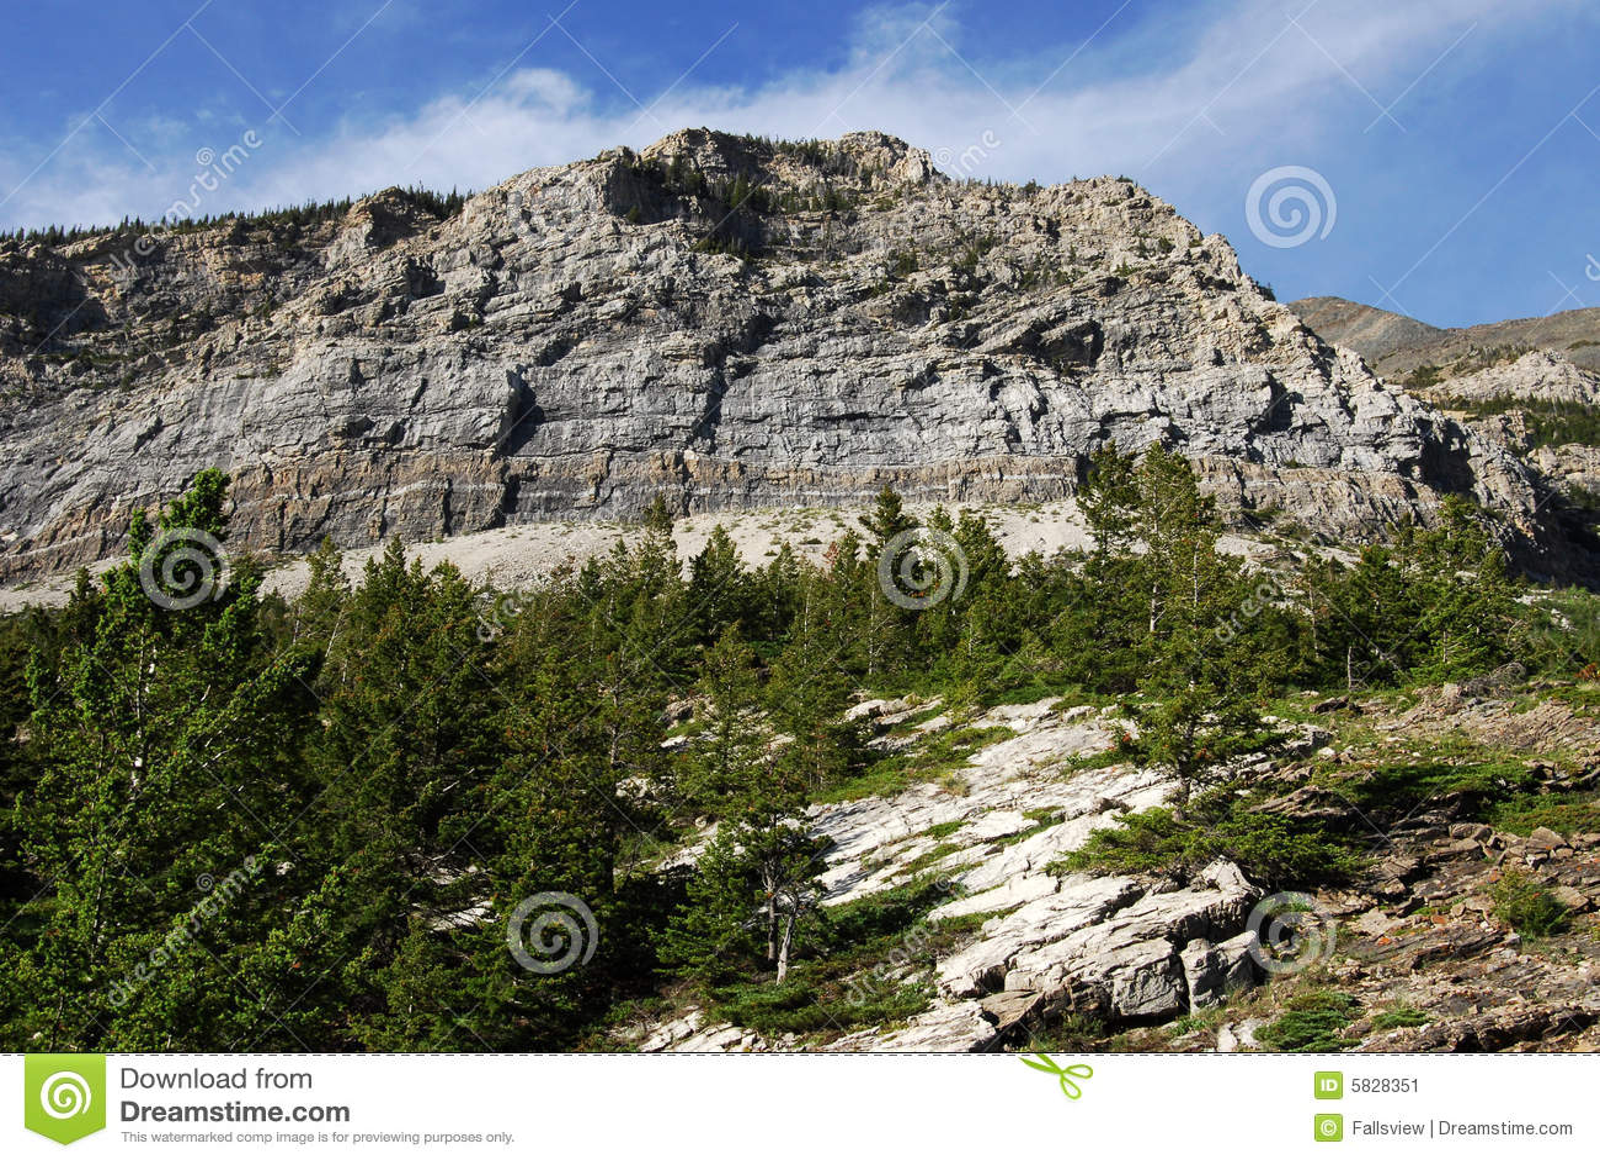 Steep cliff of mountain